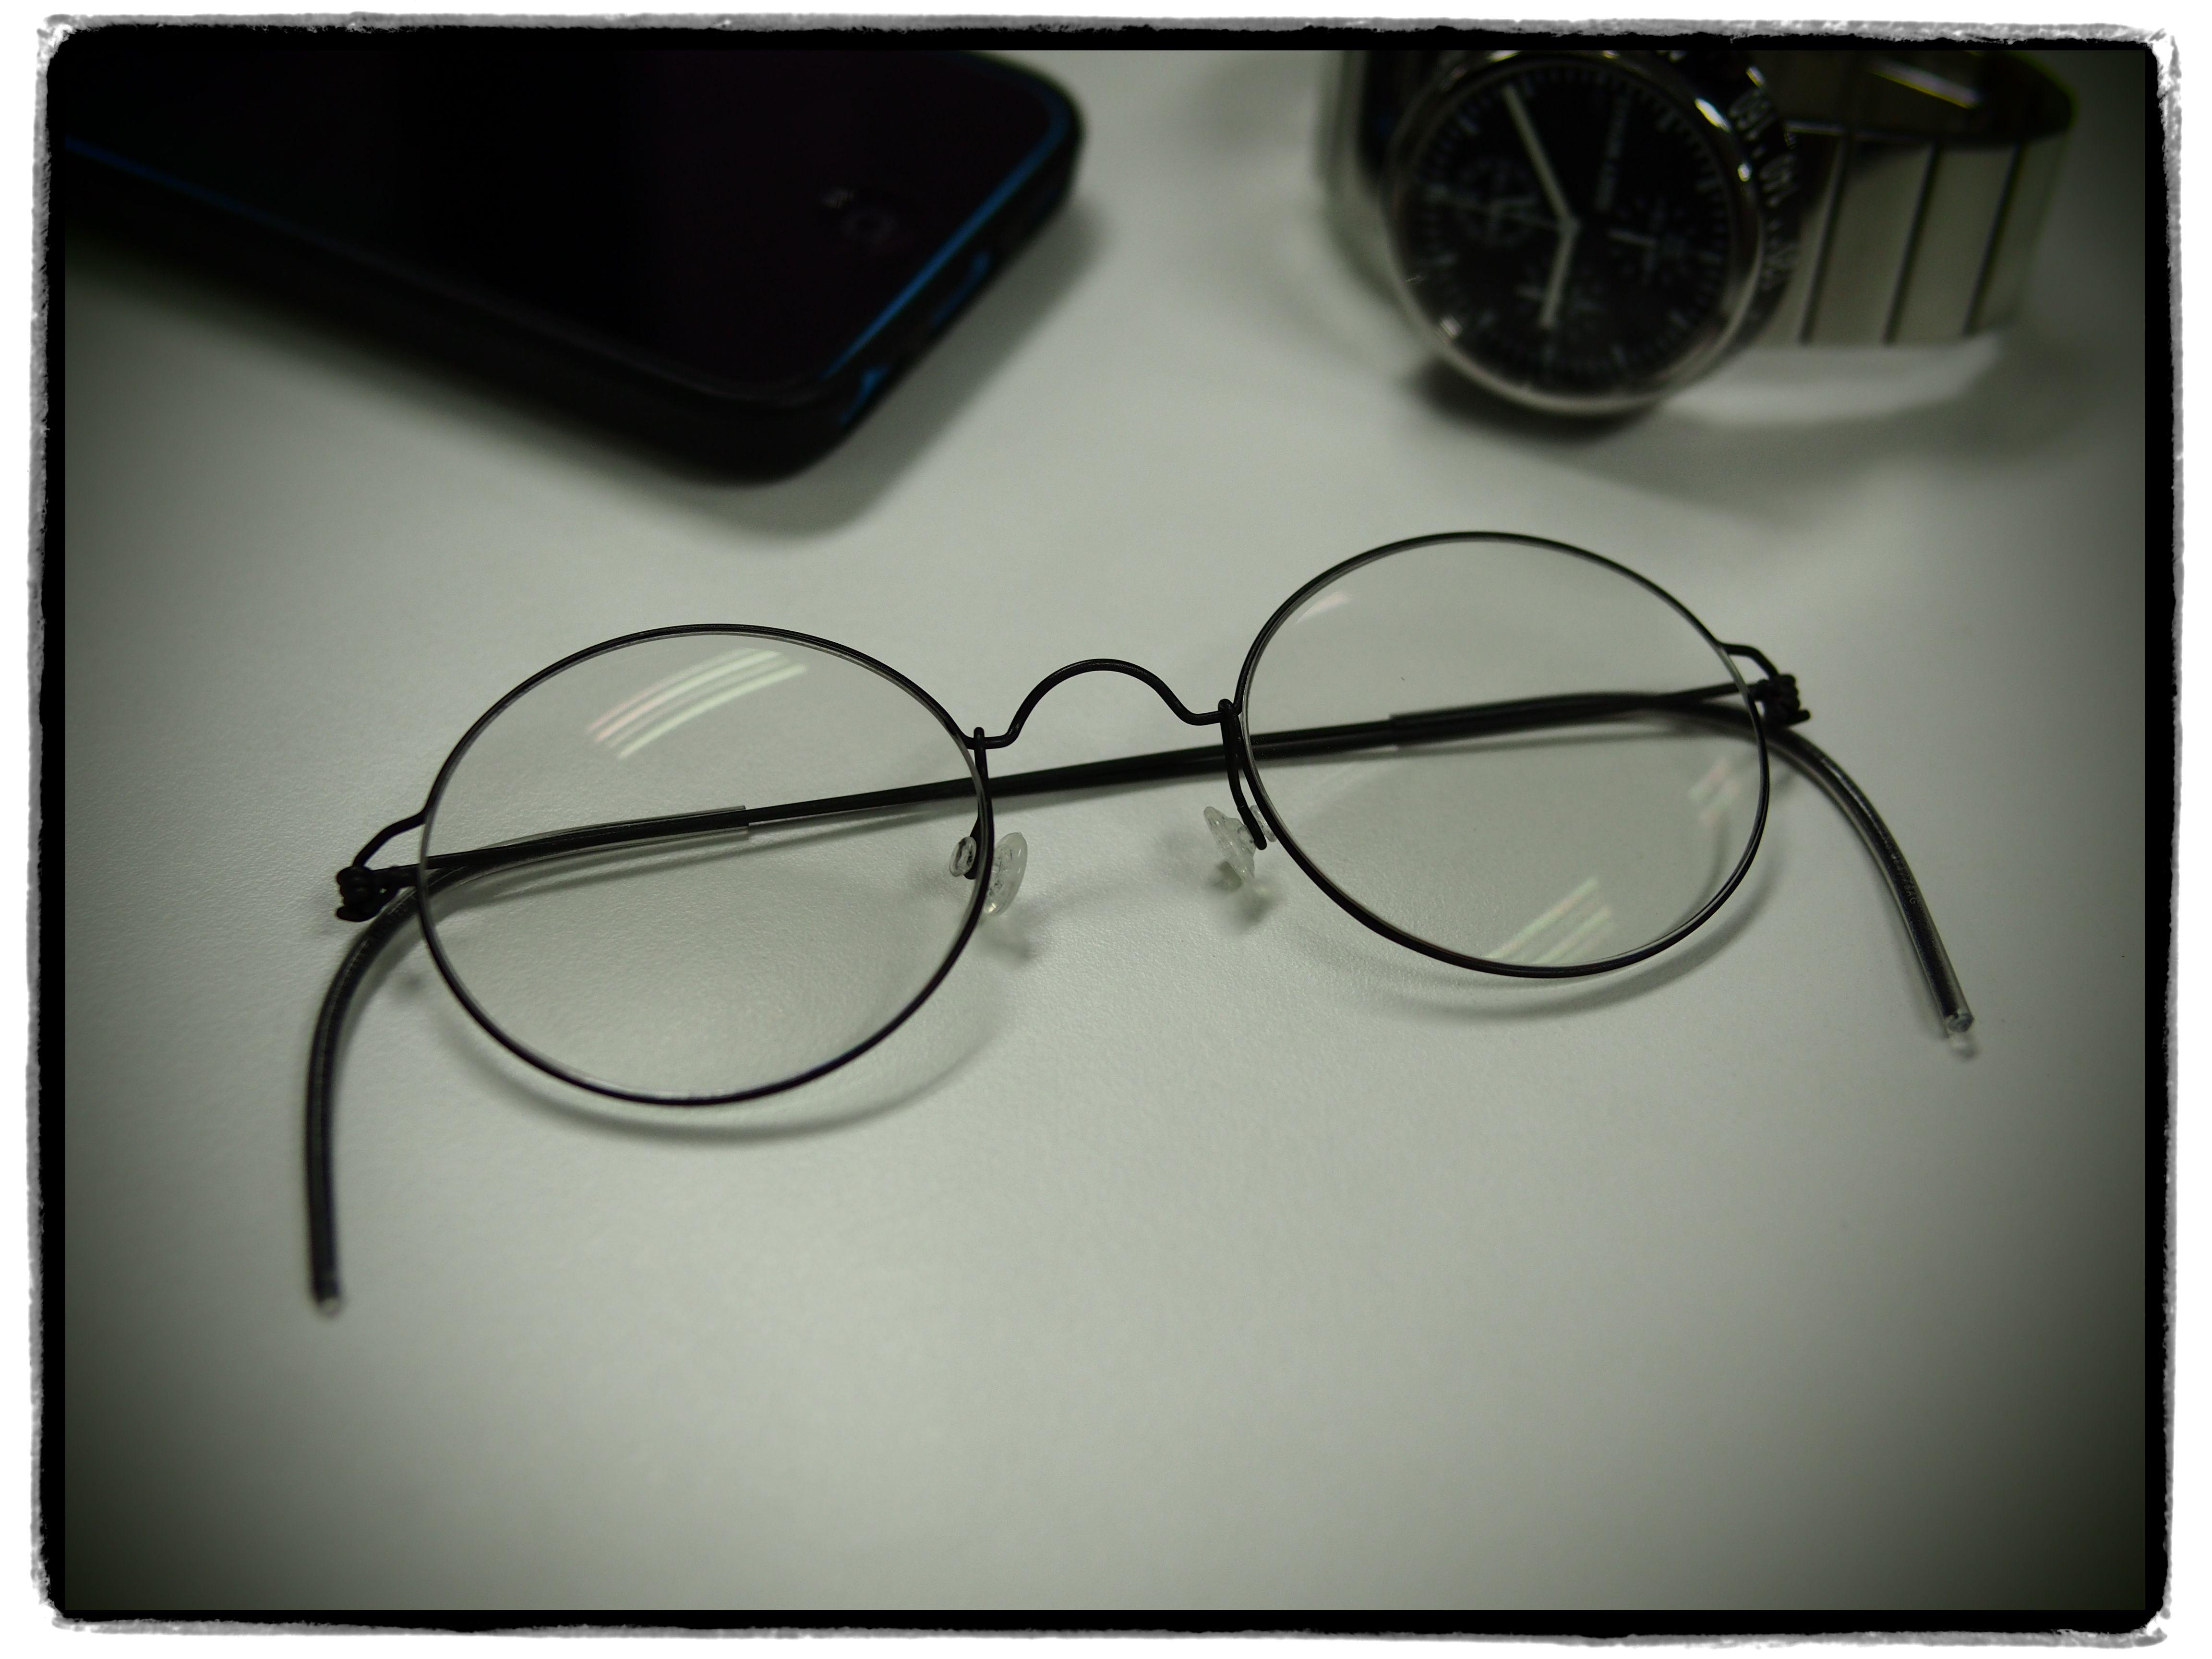 188c36f1ee1 Lindberg AIR RIM GLENN U9 Eyeglasses